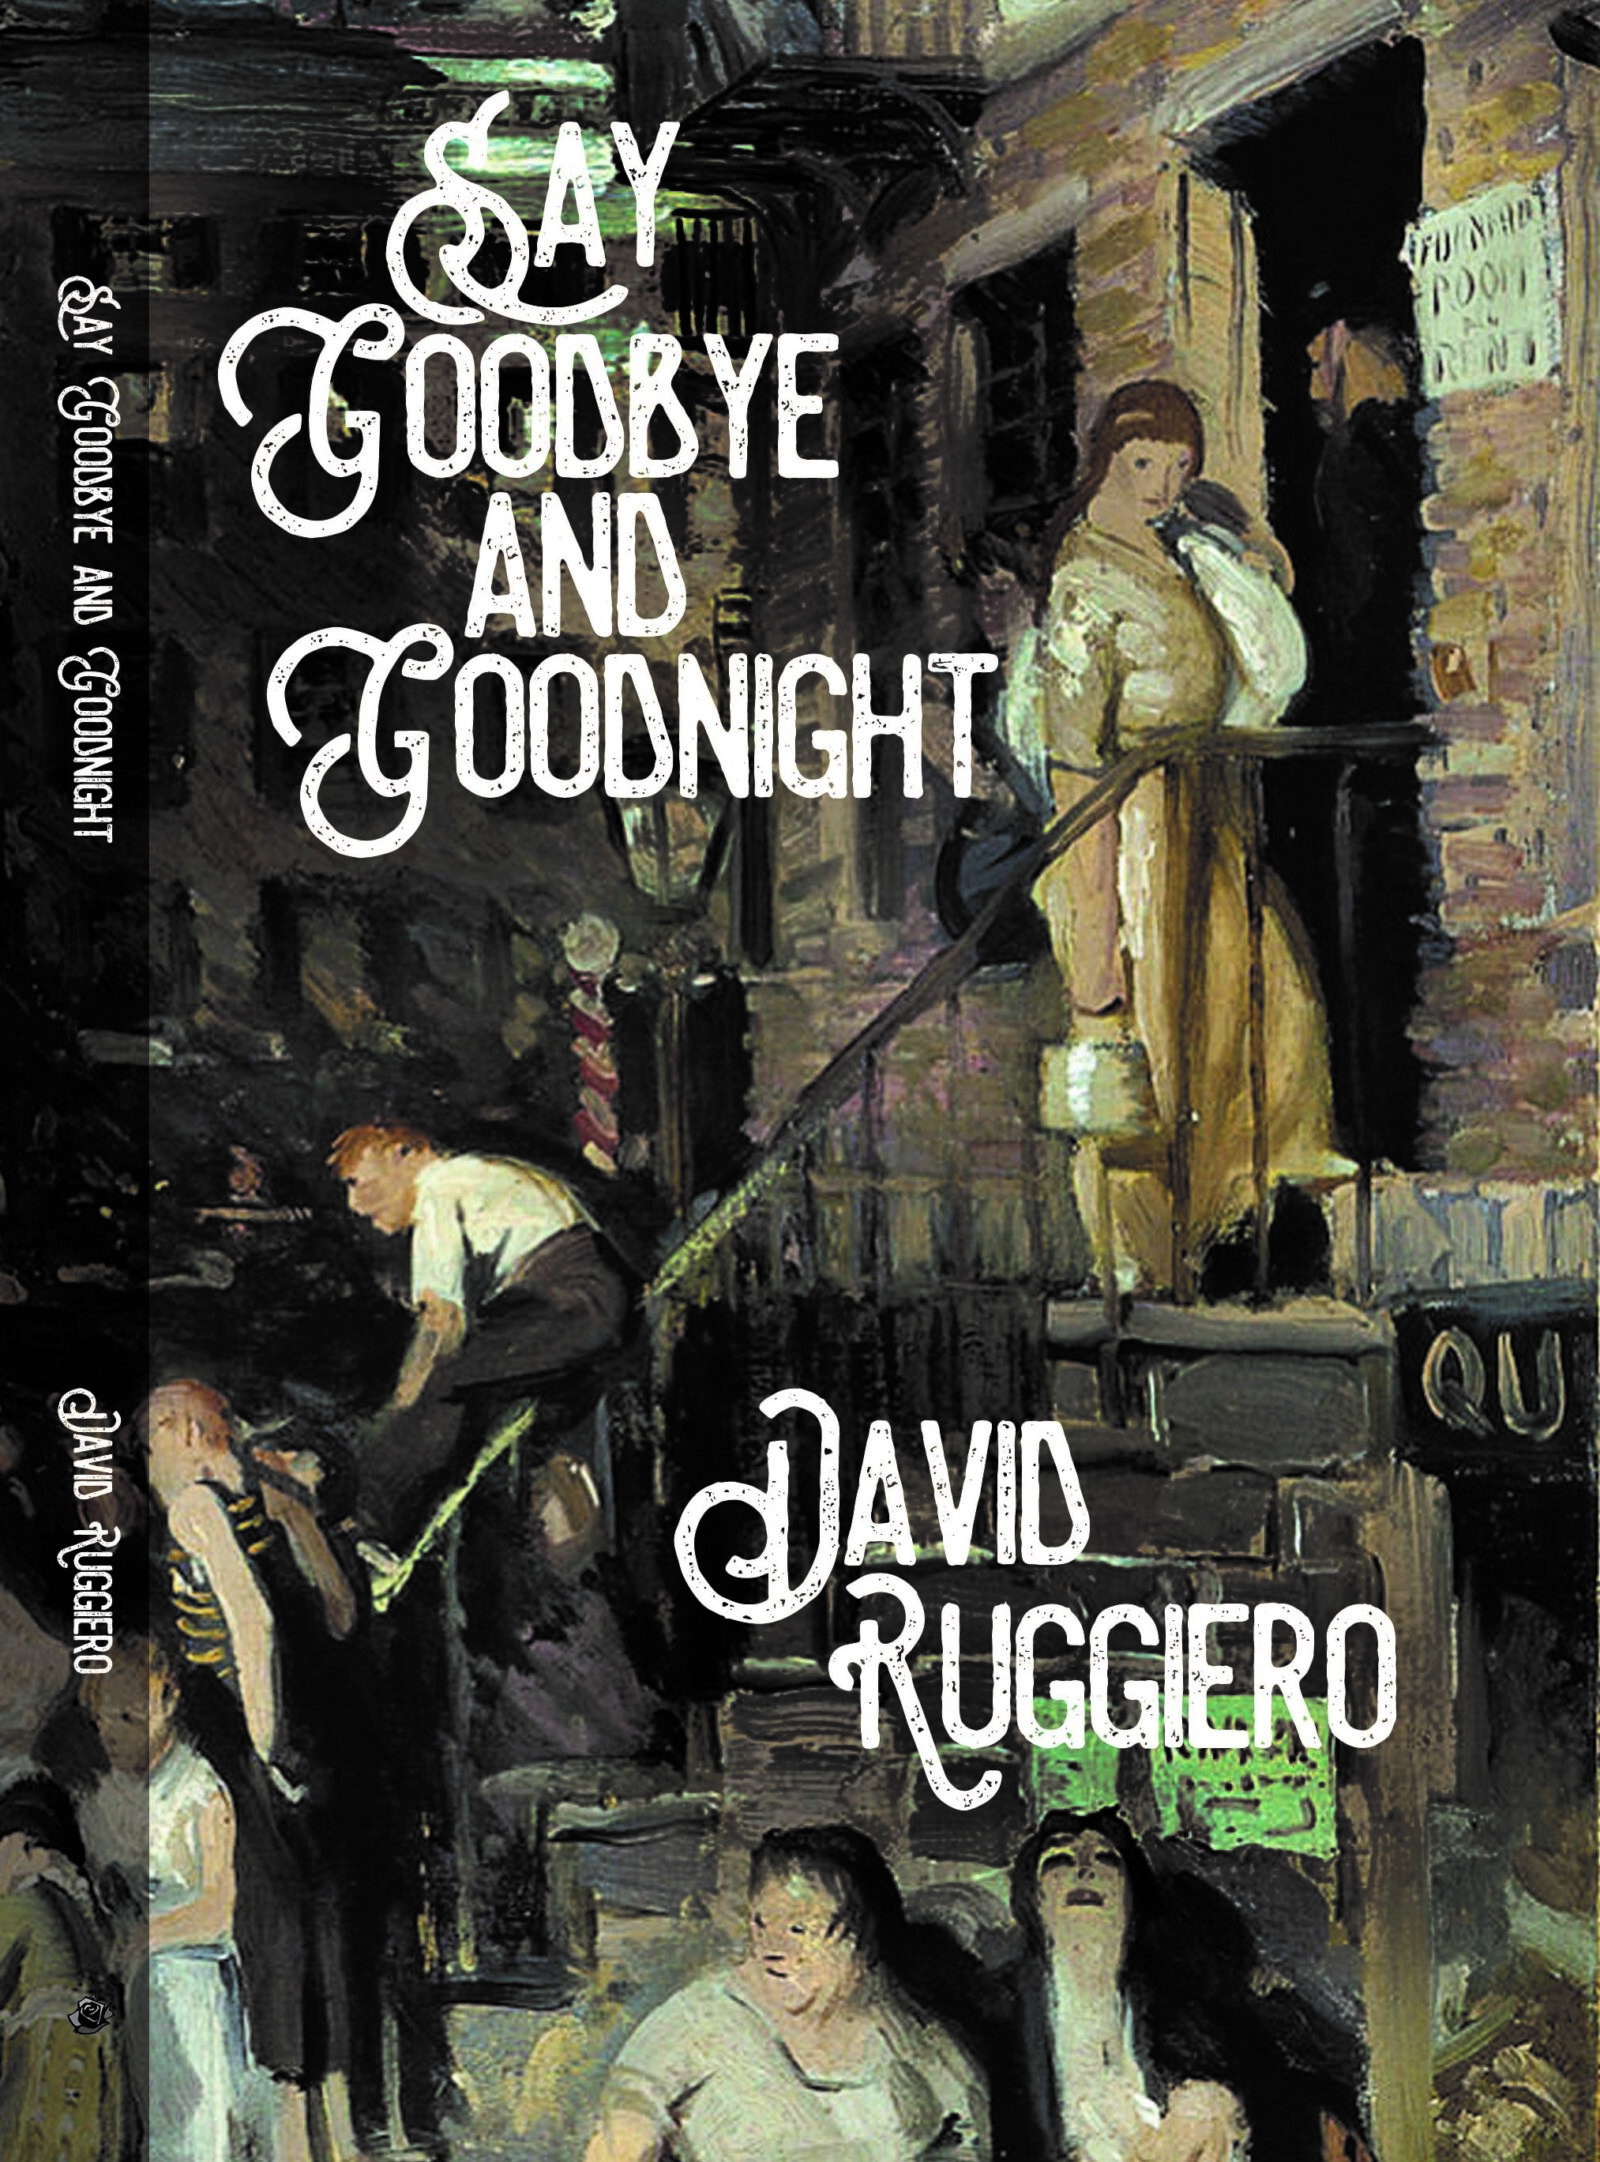 David Ruggerio's new novel, Say Goodbye and Goodnight